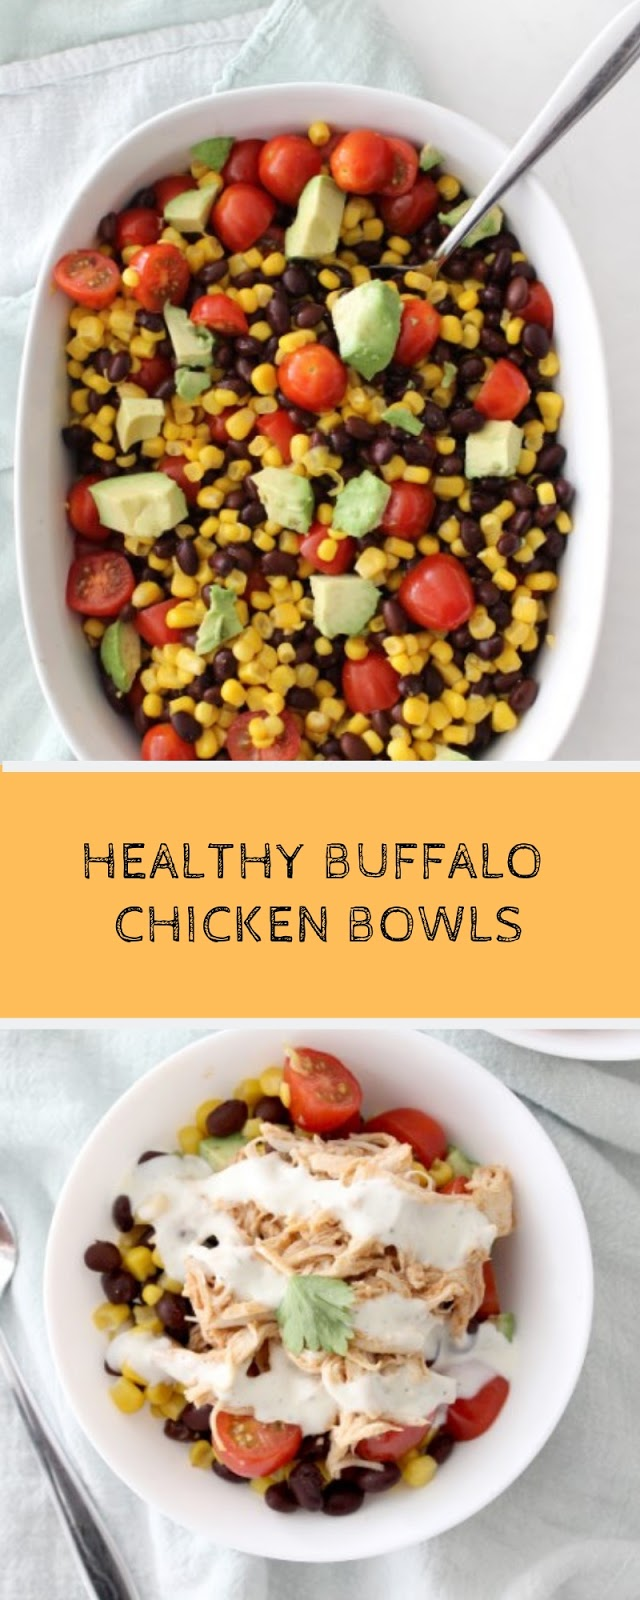 Buffalo Chicken Bowls